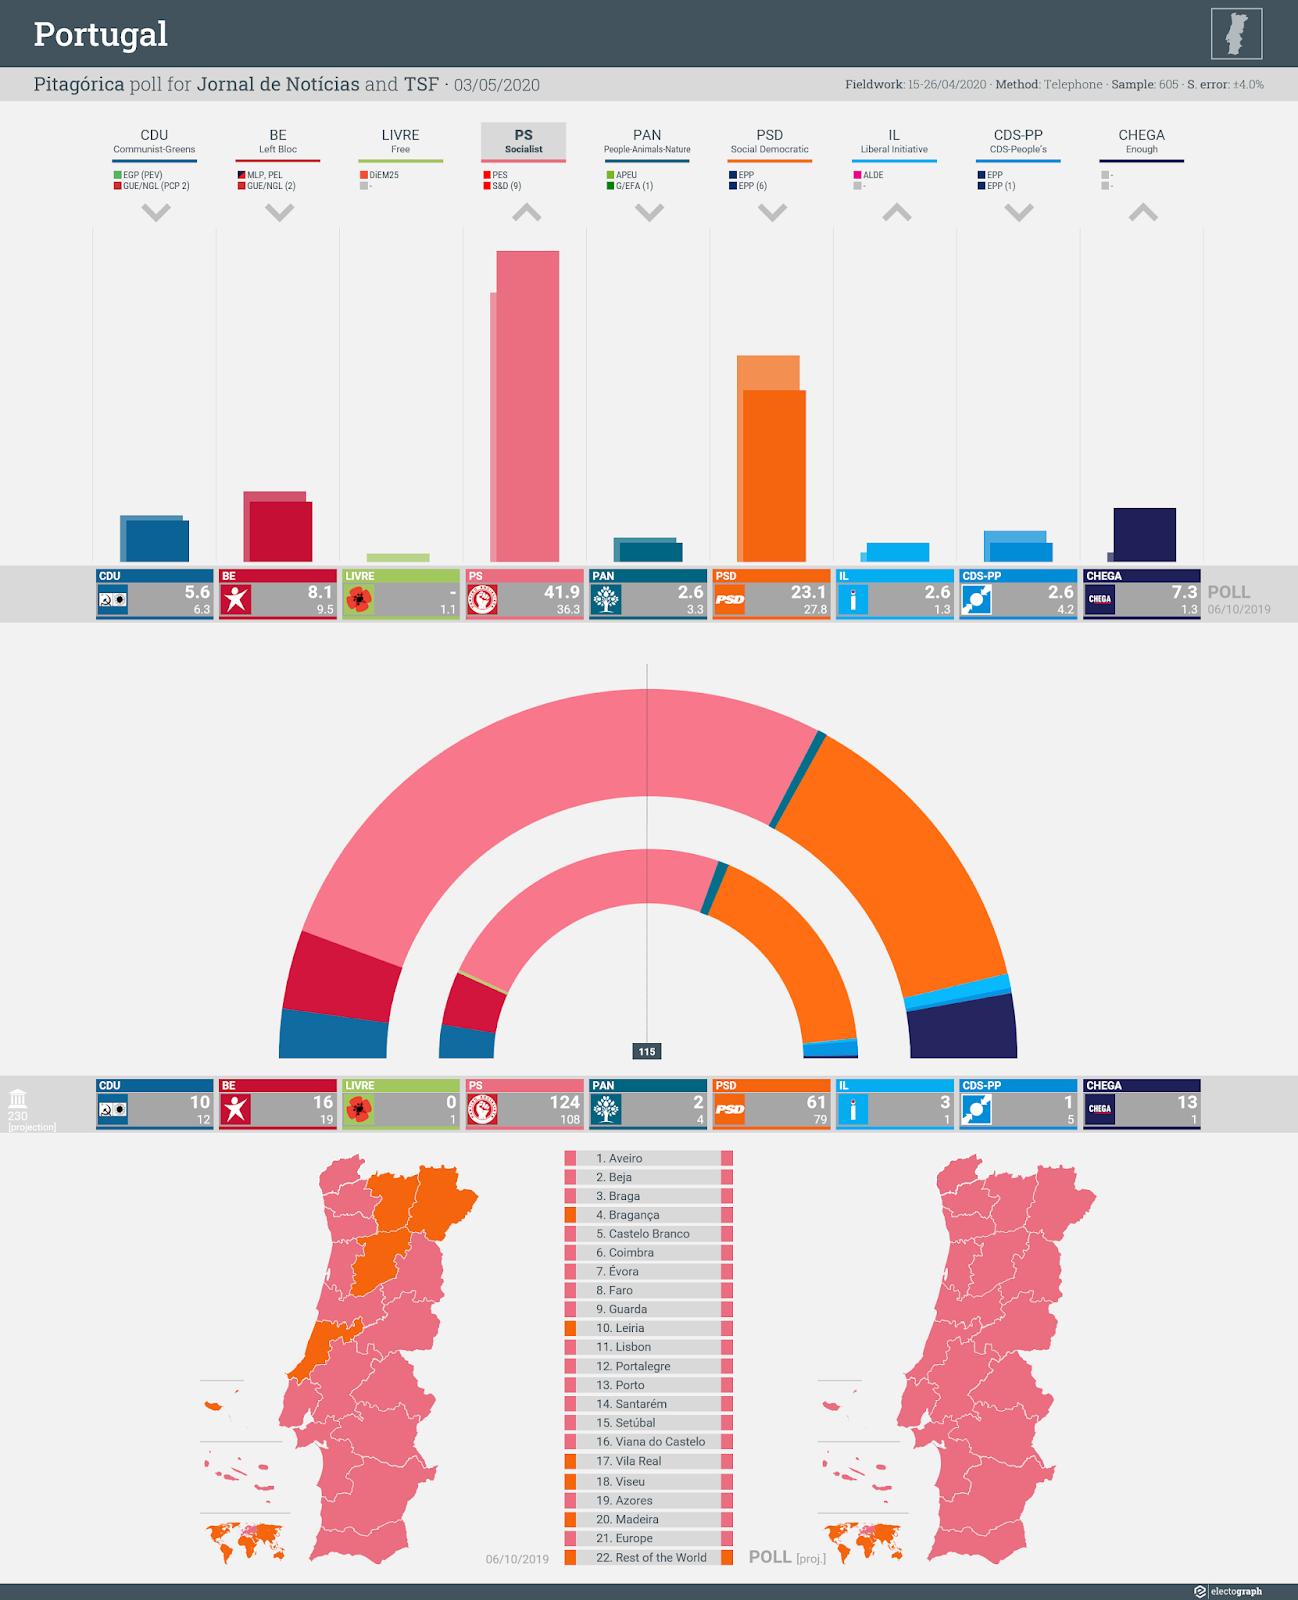 PORTUGAL: Pitagórica poll chart for Jornal de Notícias and TSF, 3 May 2020